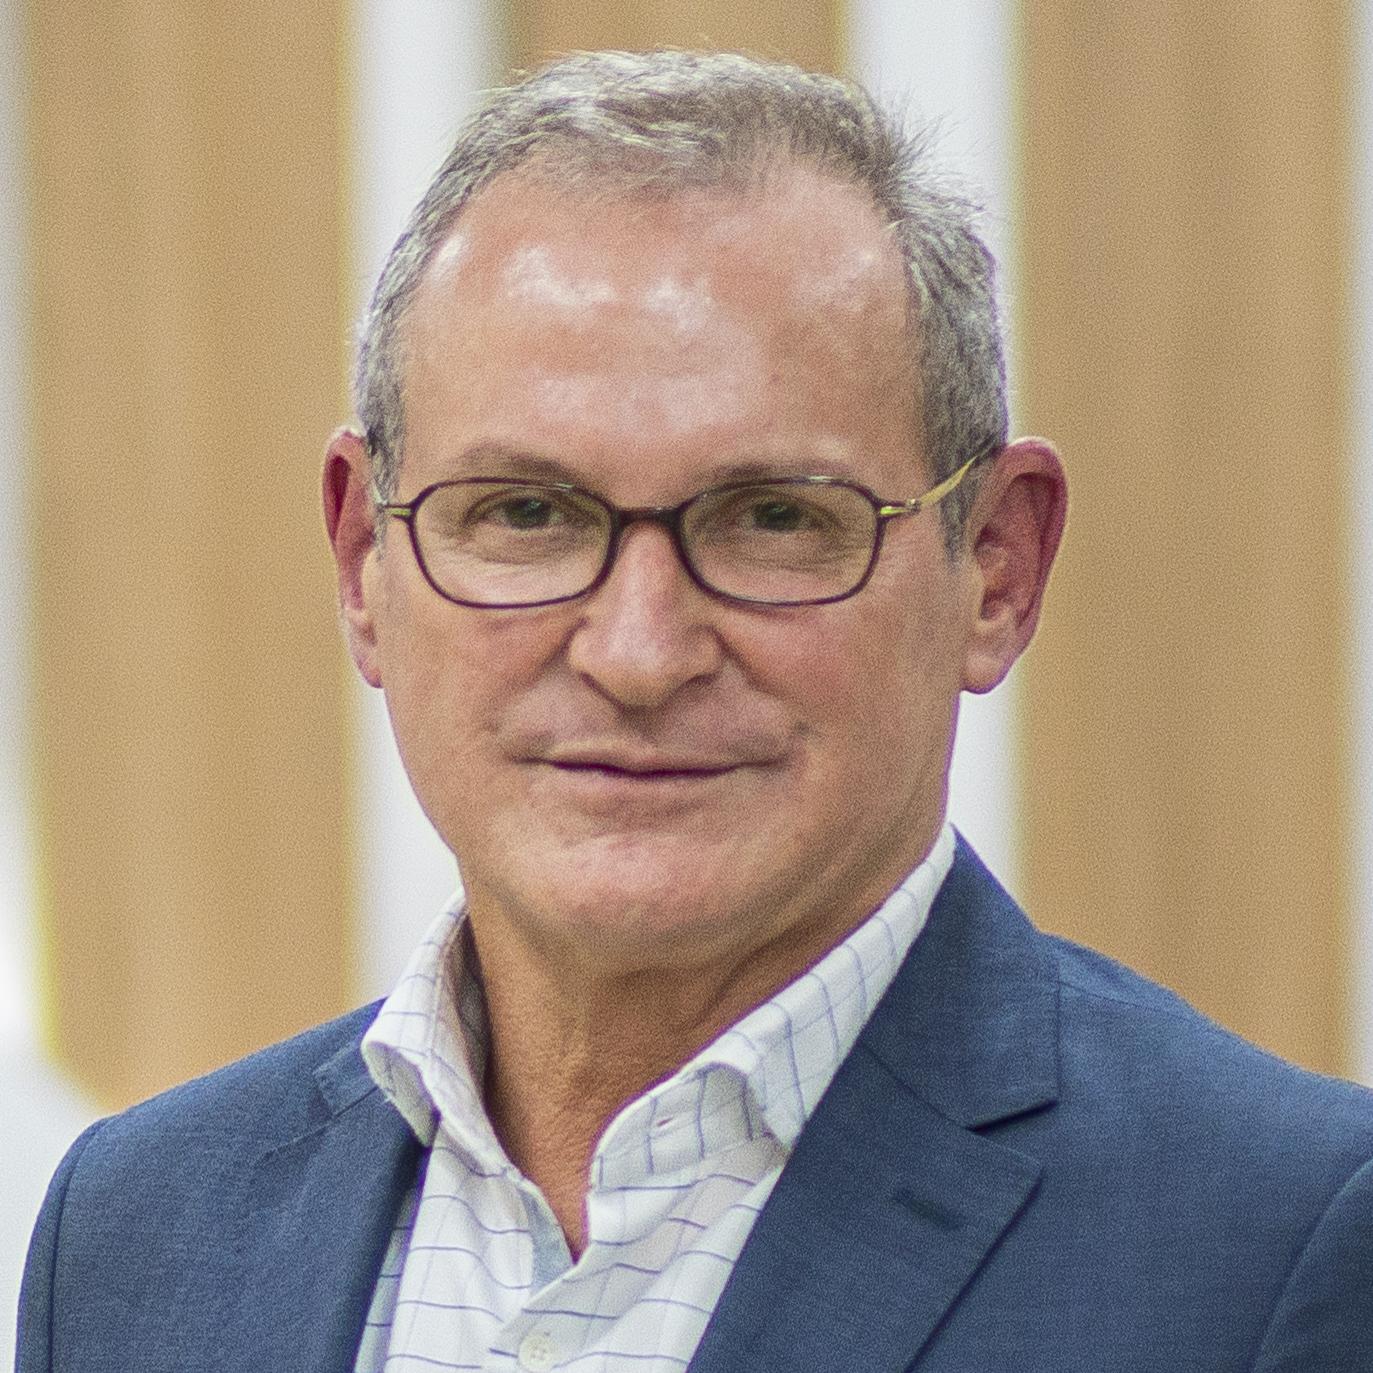 Professor Alexandre Nunes Theodoro